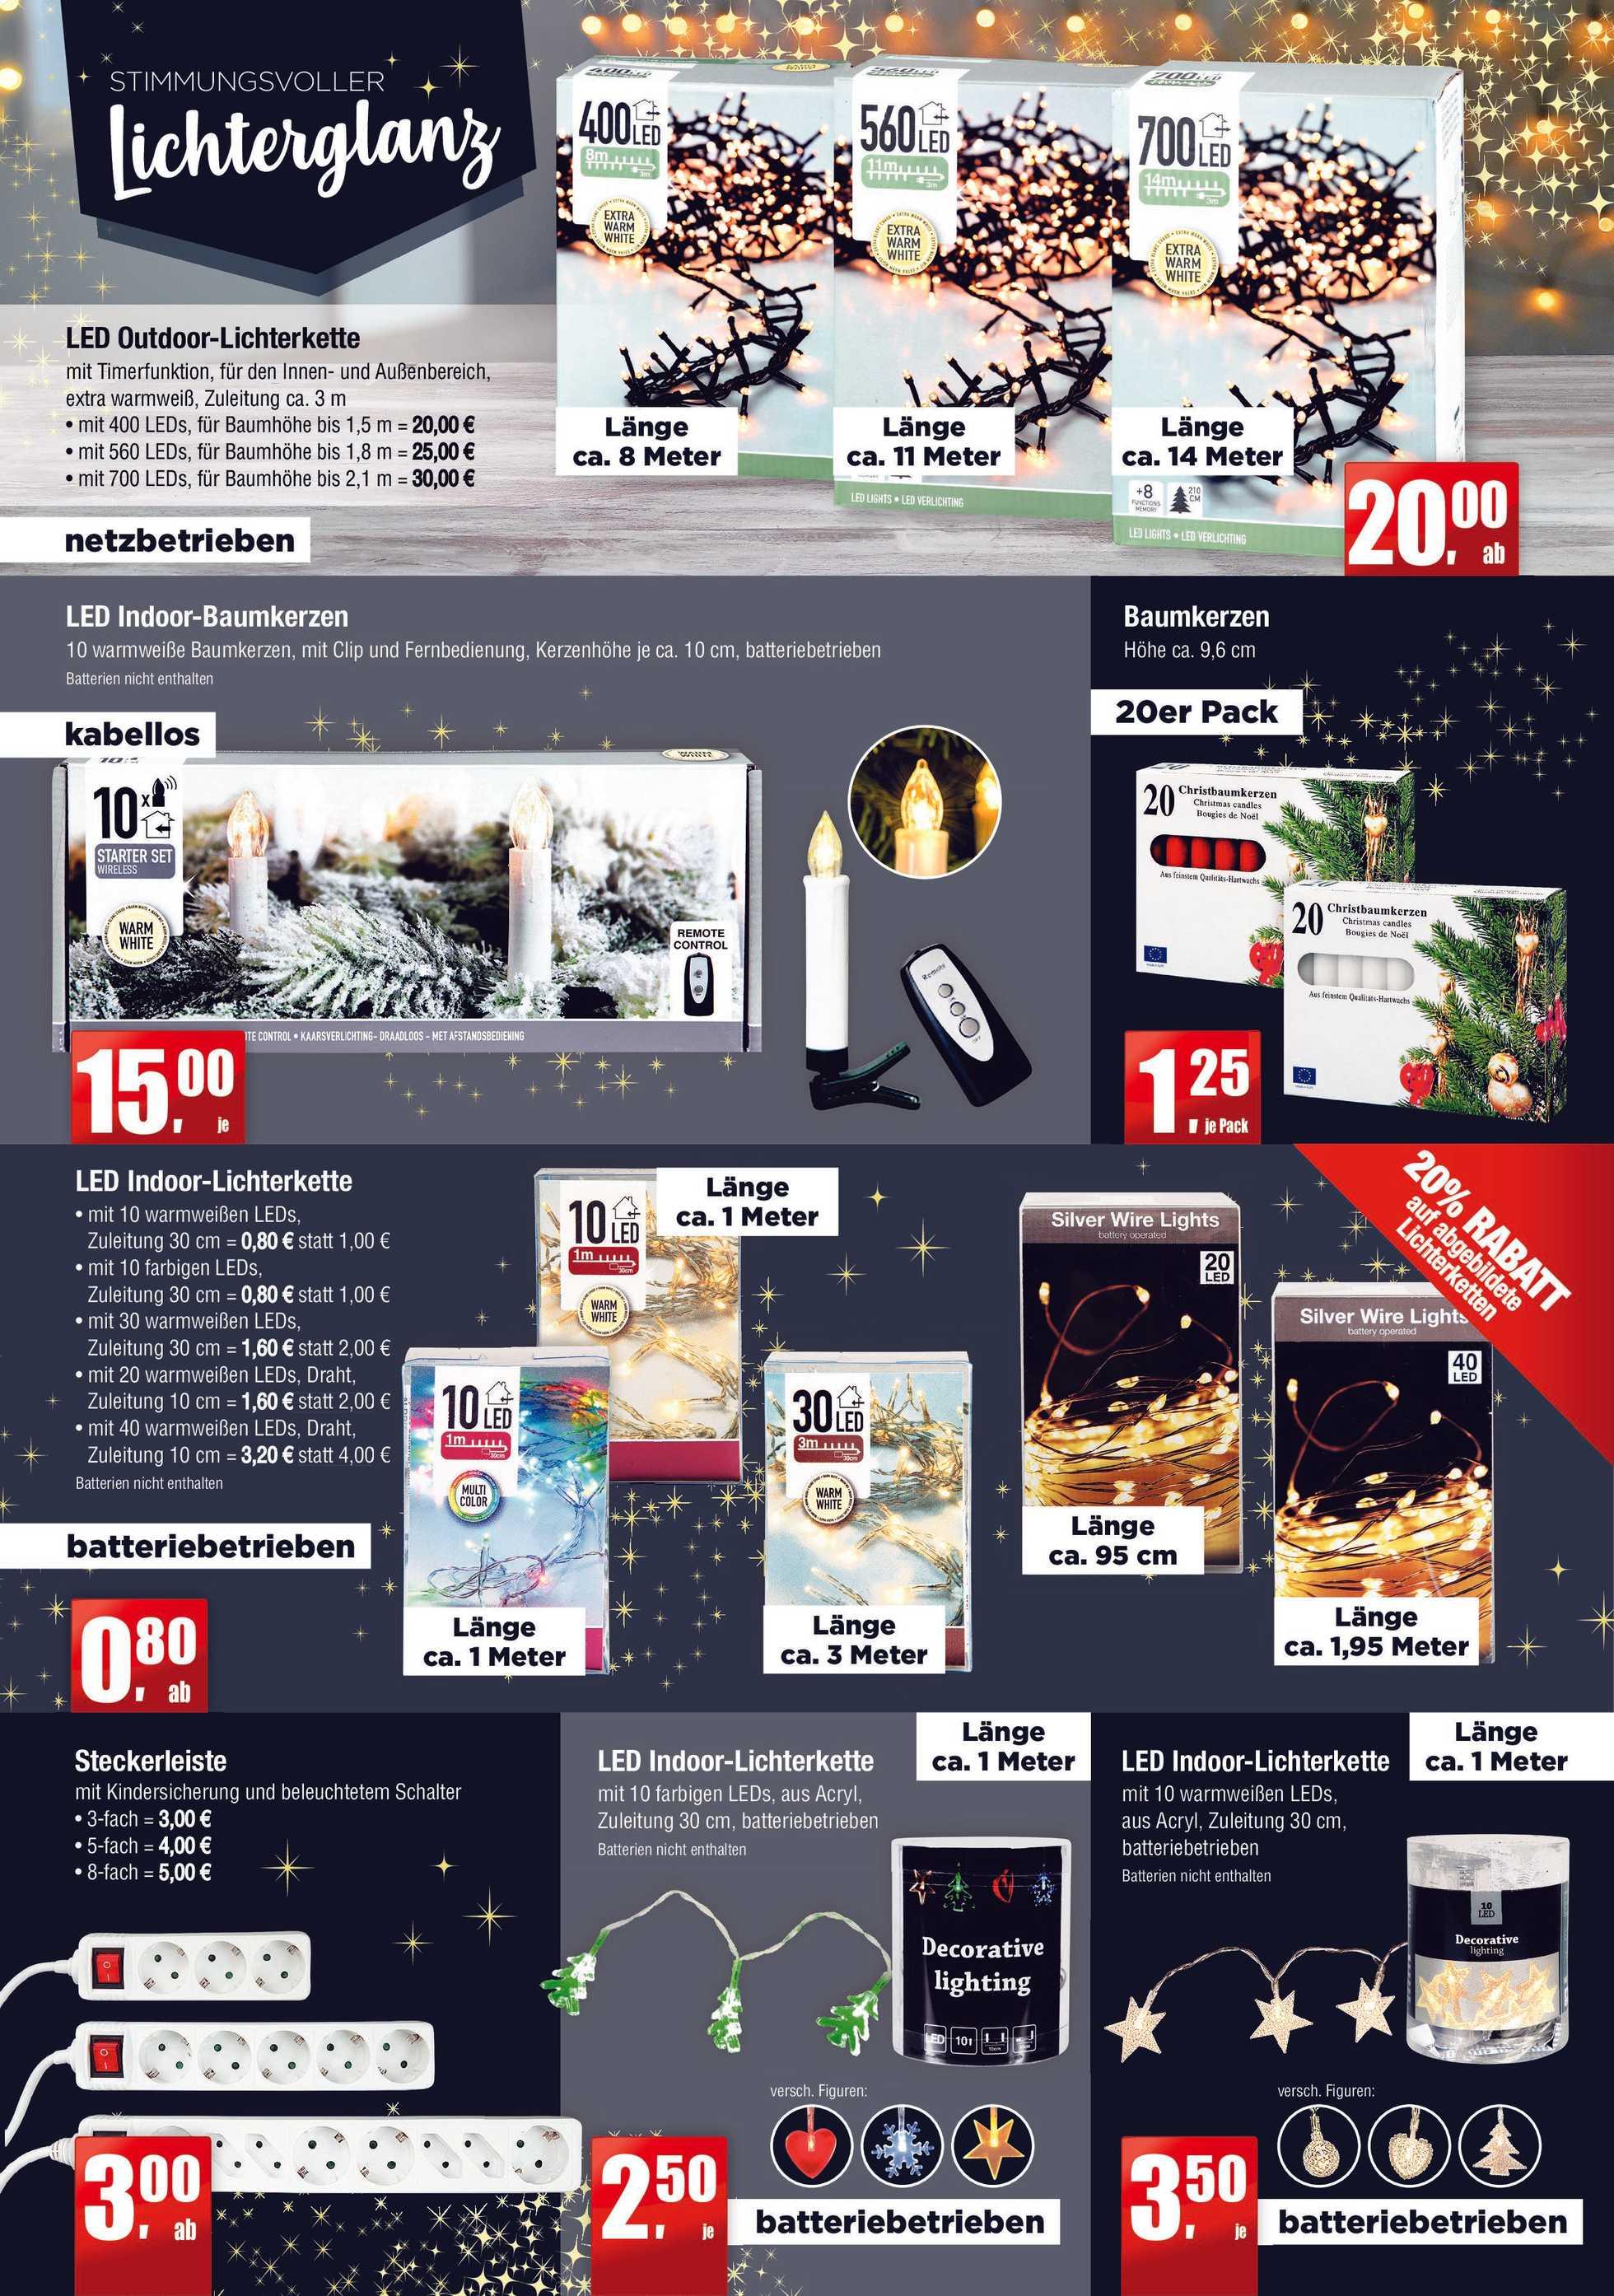 Mäc Geiz Werbeflugblatt 061218 Depromotonscom